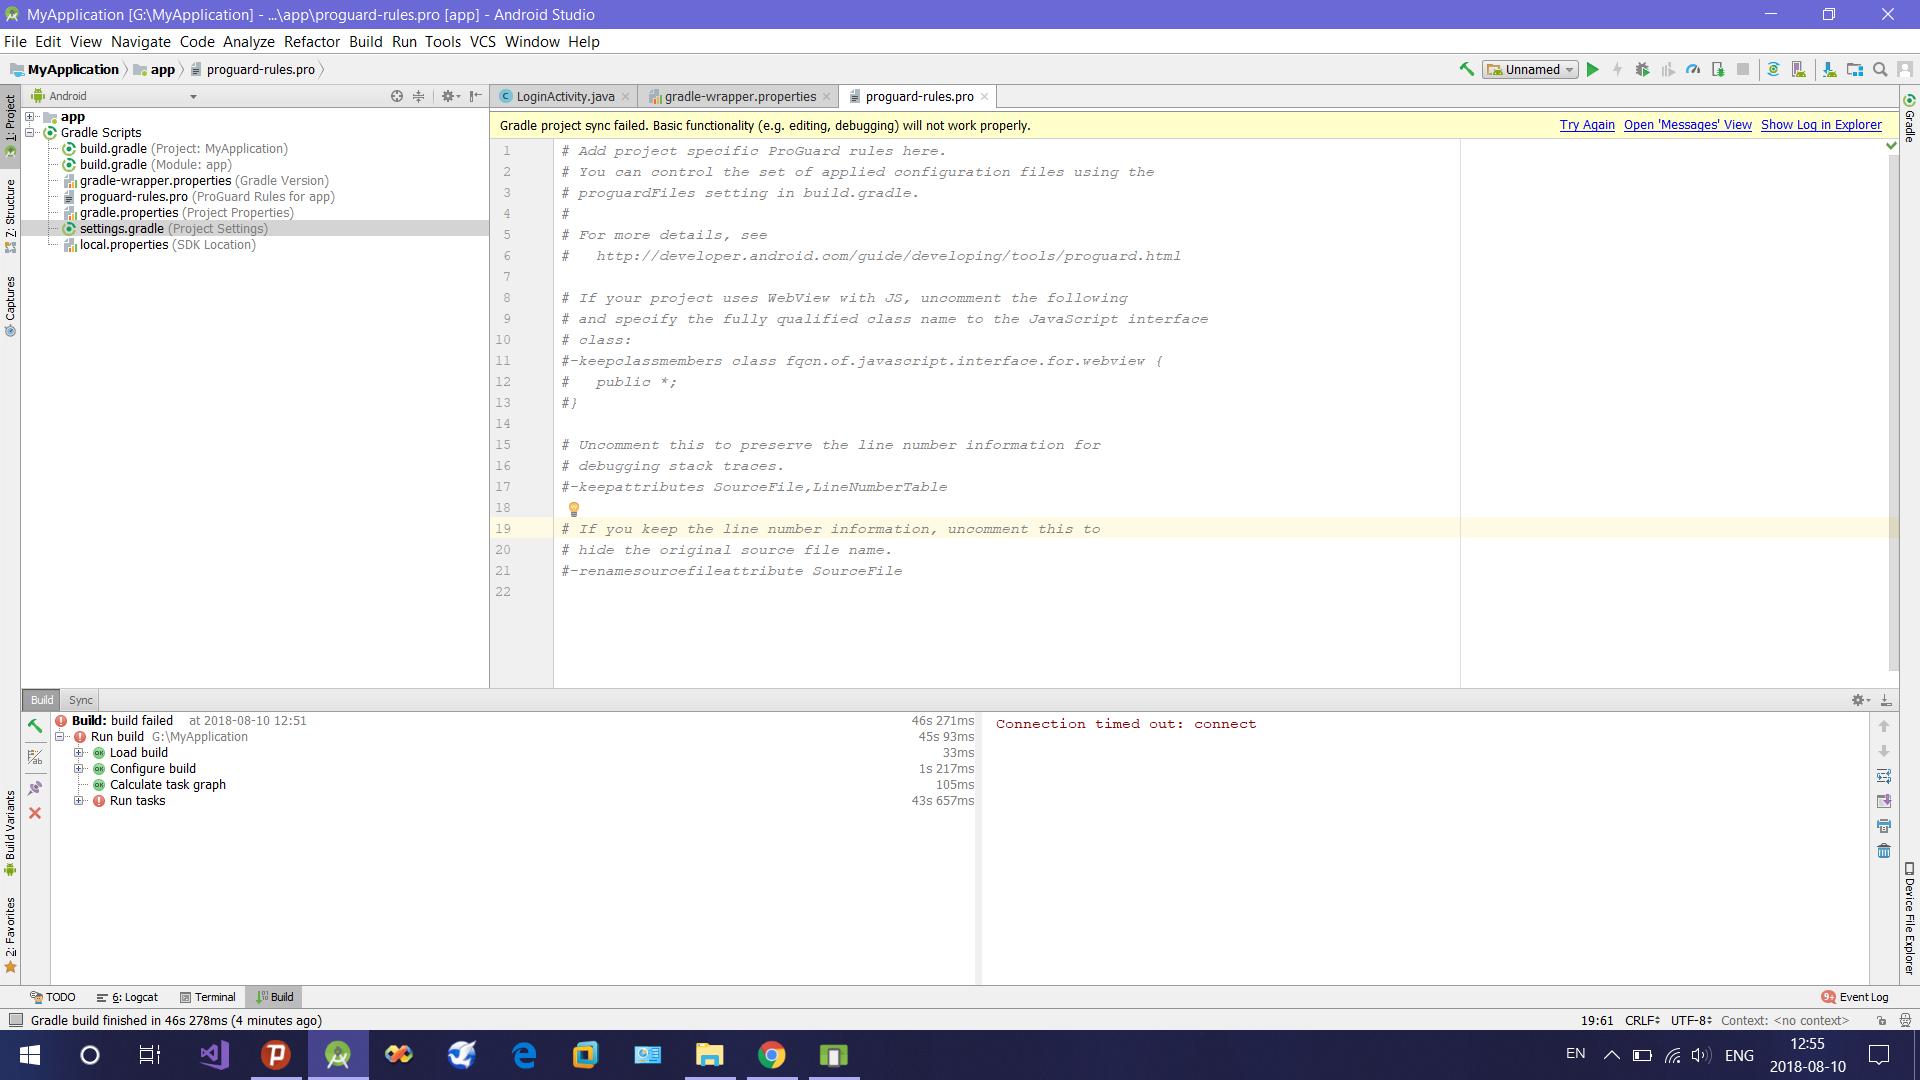 5b6d4e1e458d8_Screenshot(39).png.ff947d0694ec25996f4341edffc6daf0.png